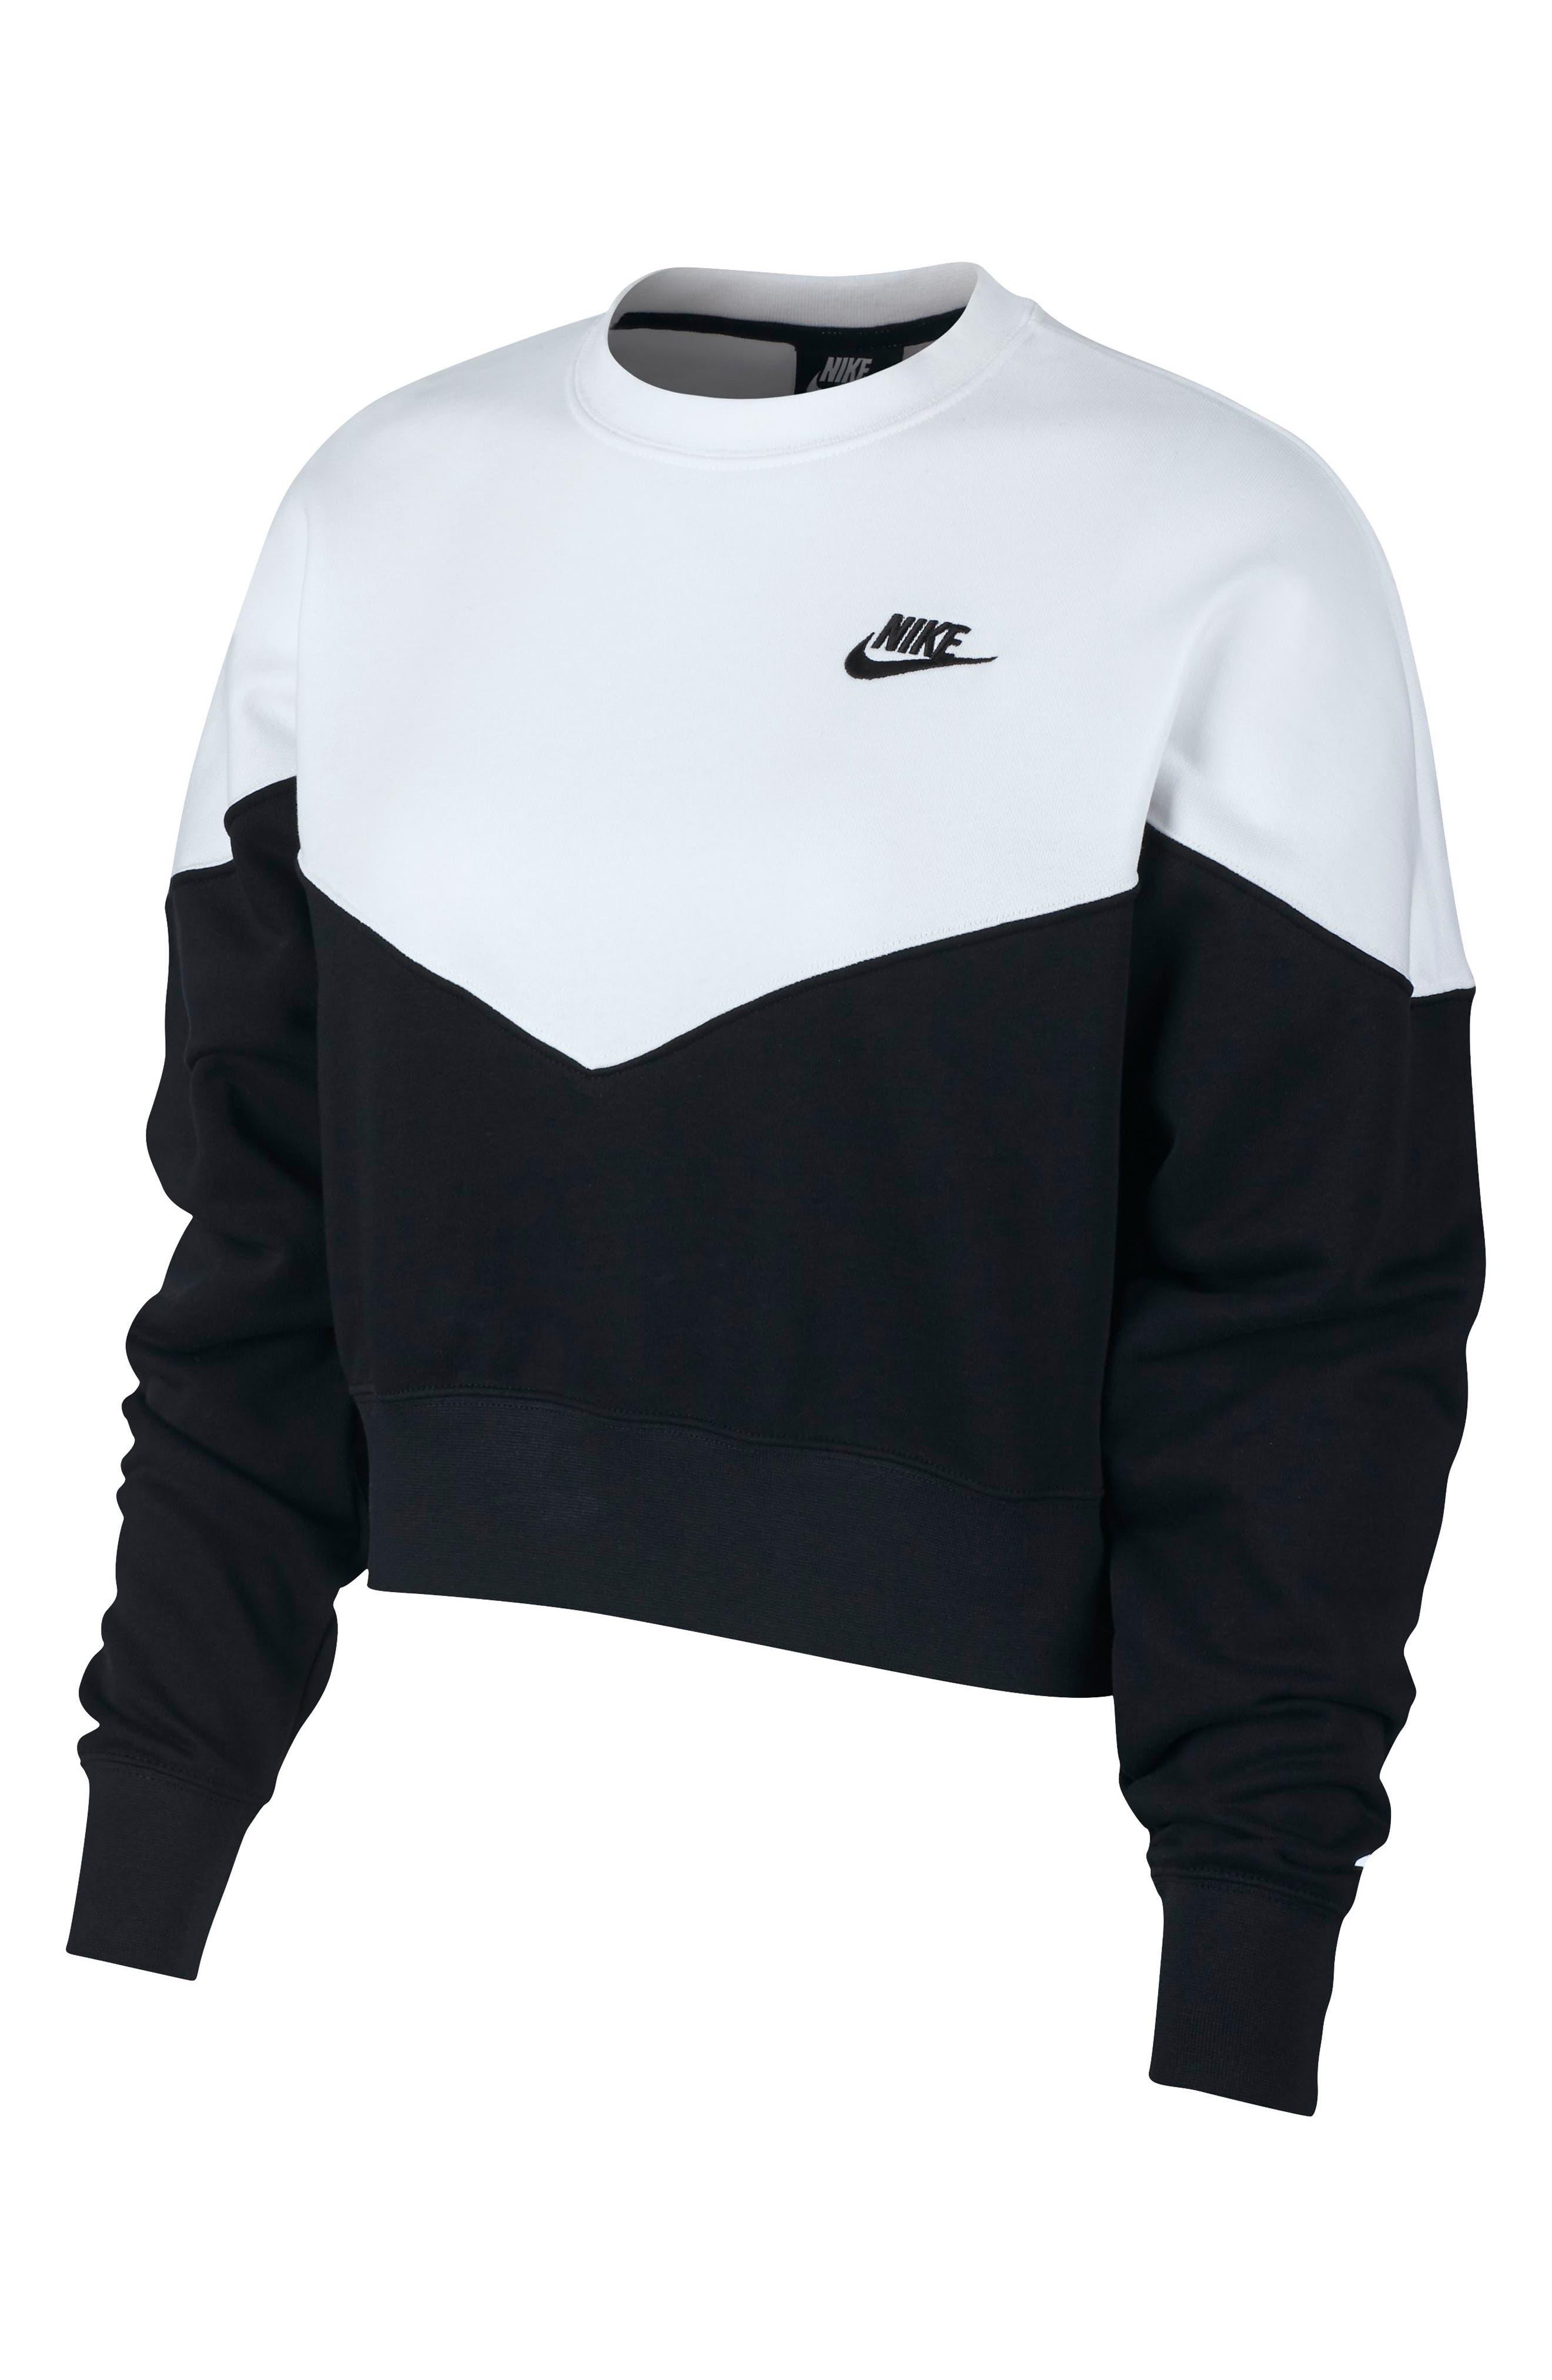 NIKE, Sportswear Heritage Fleece Sweatshirt, Main thumbnail 1, color, BLACK/ WHITE/ BLACK